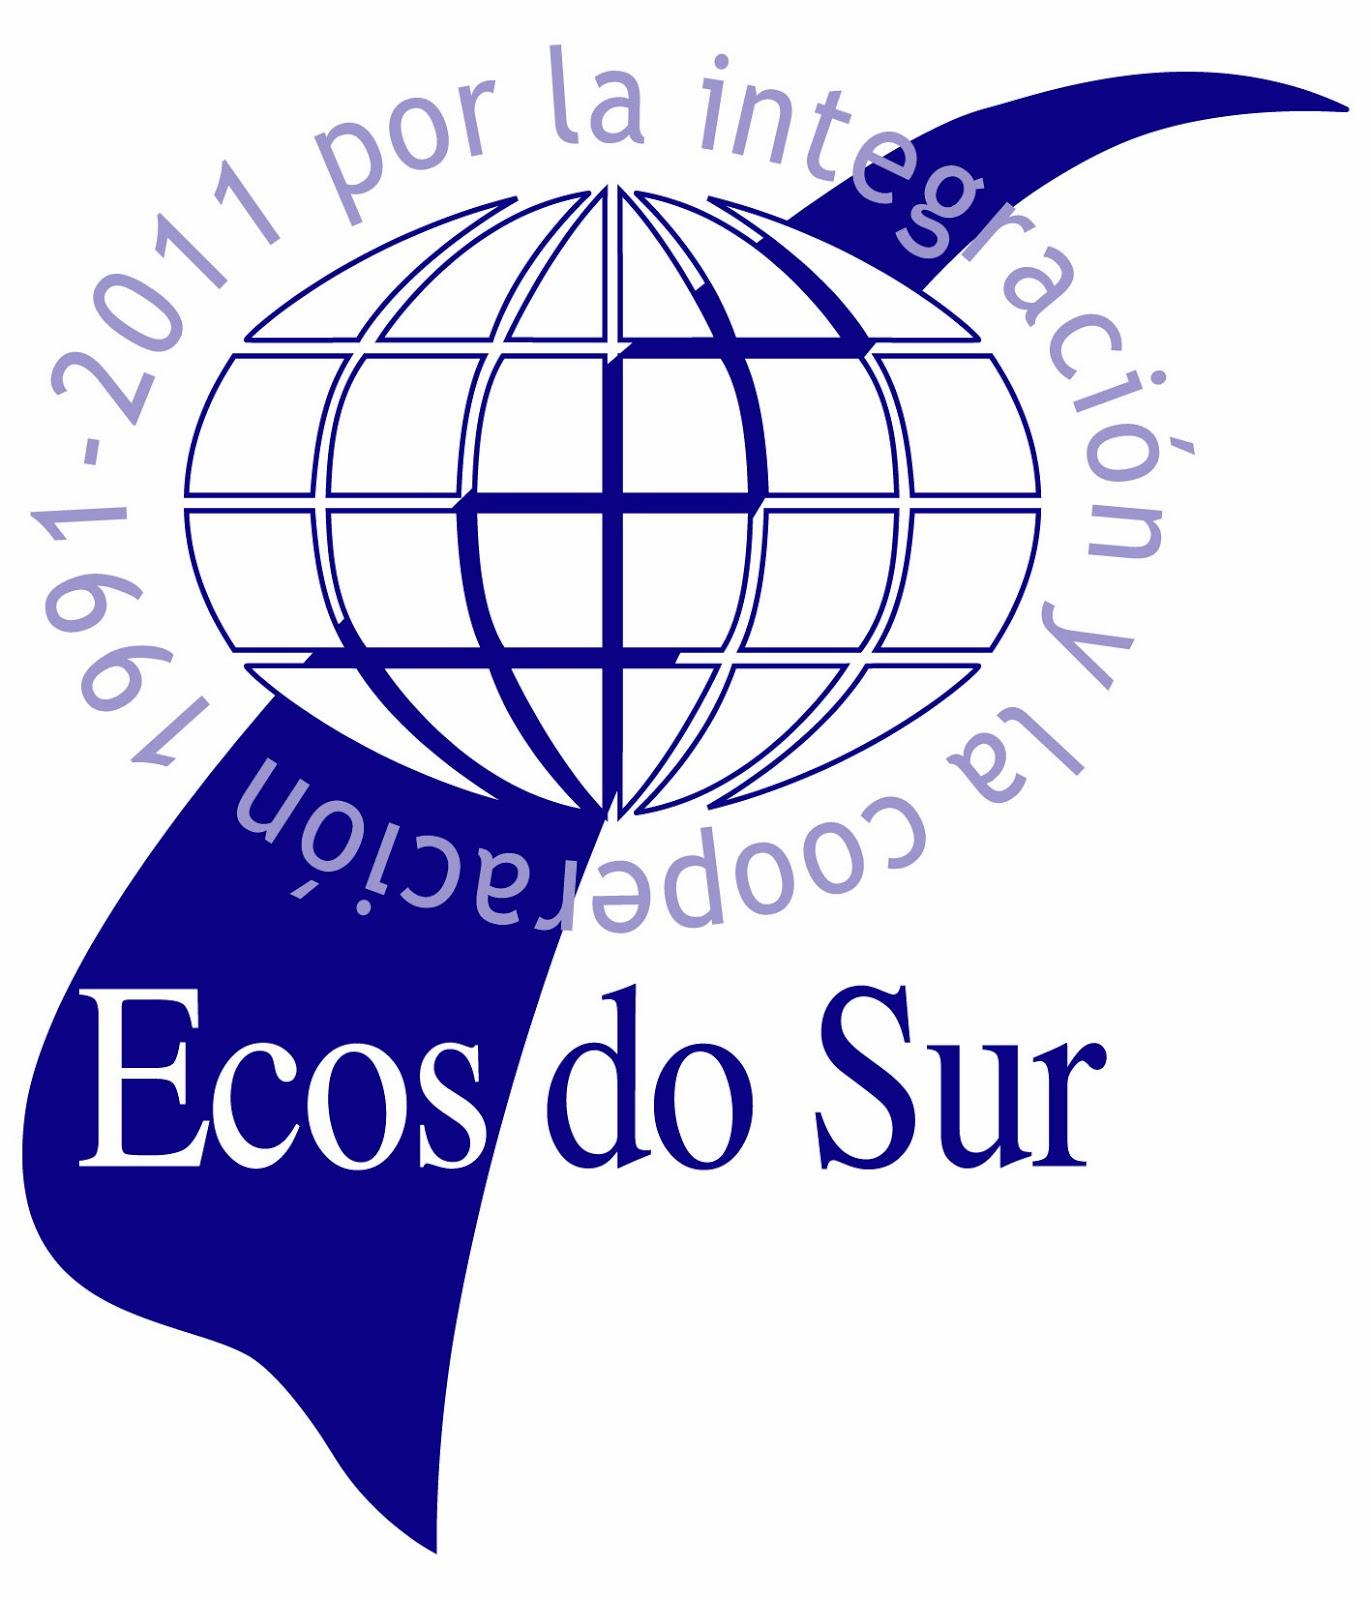 www.ecosdosur.org